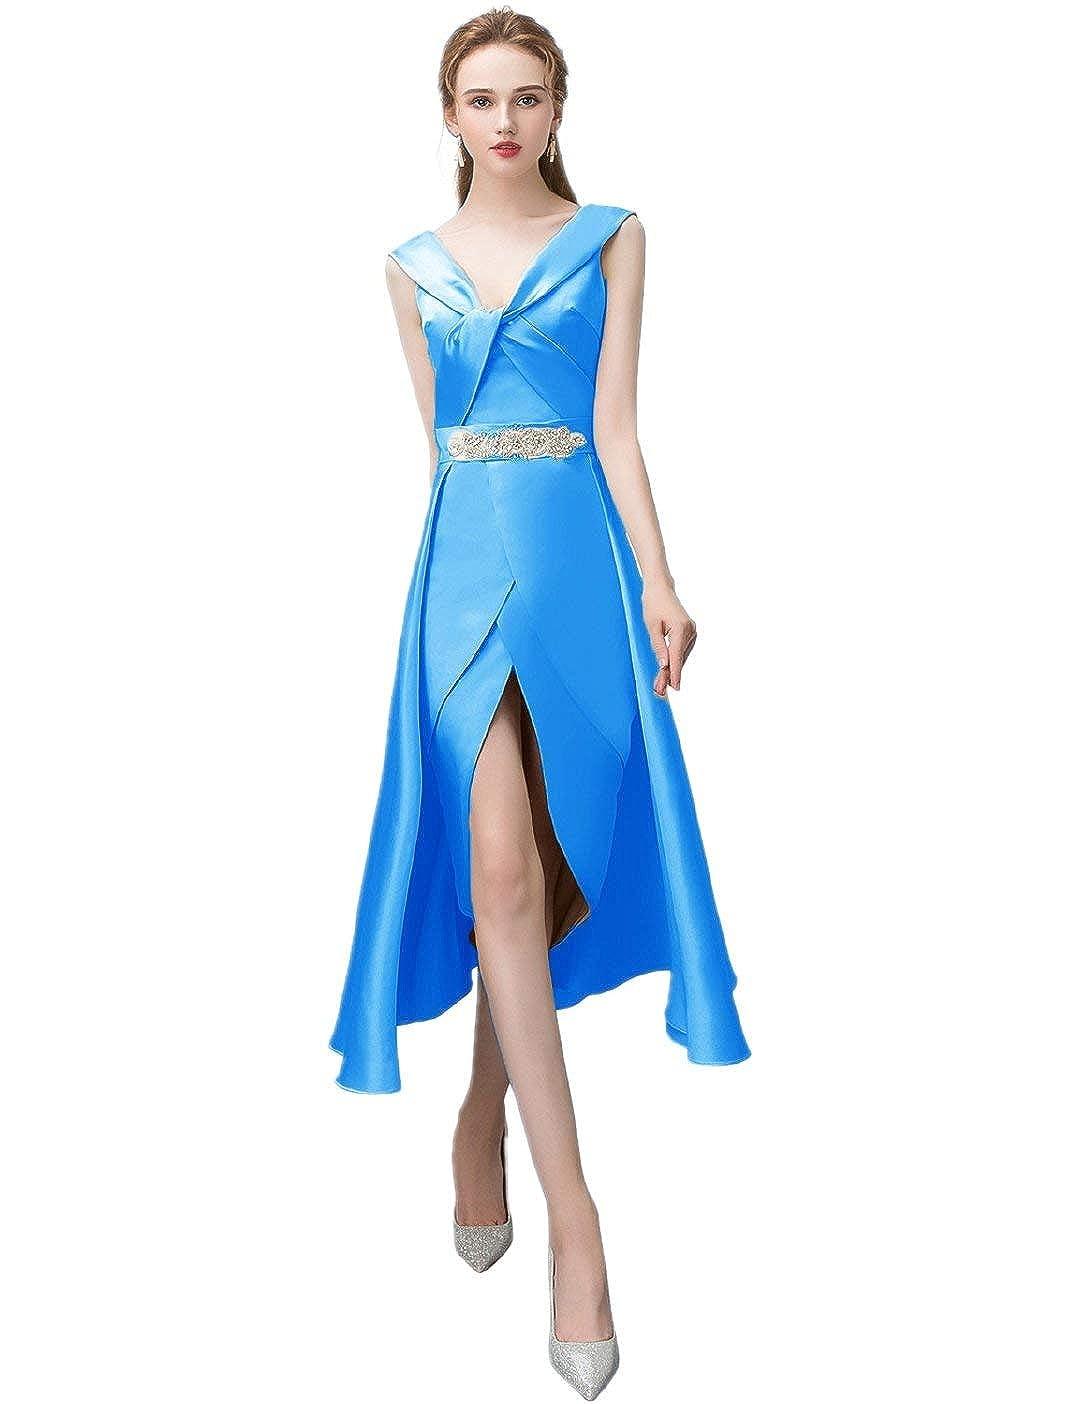 bluee Anshirlisa Women's Sleeveless Credver Pleat HighLow Satin Gown Dress